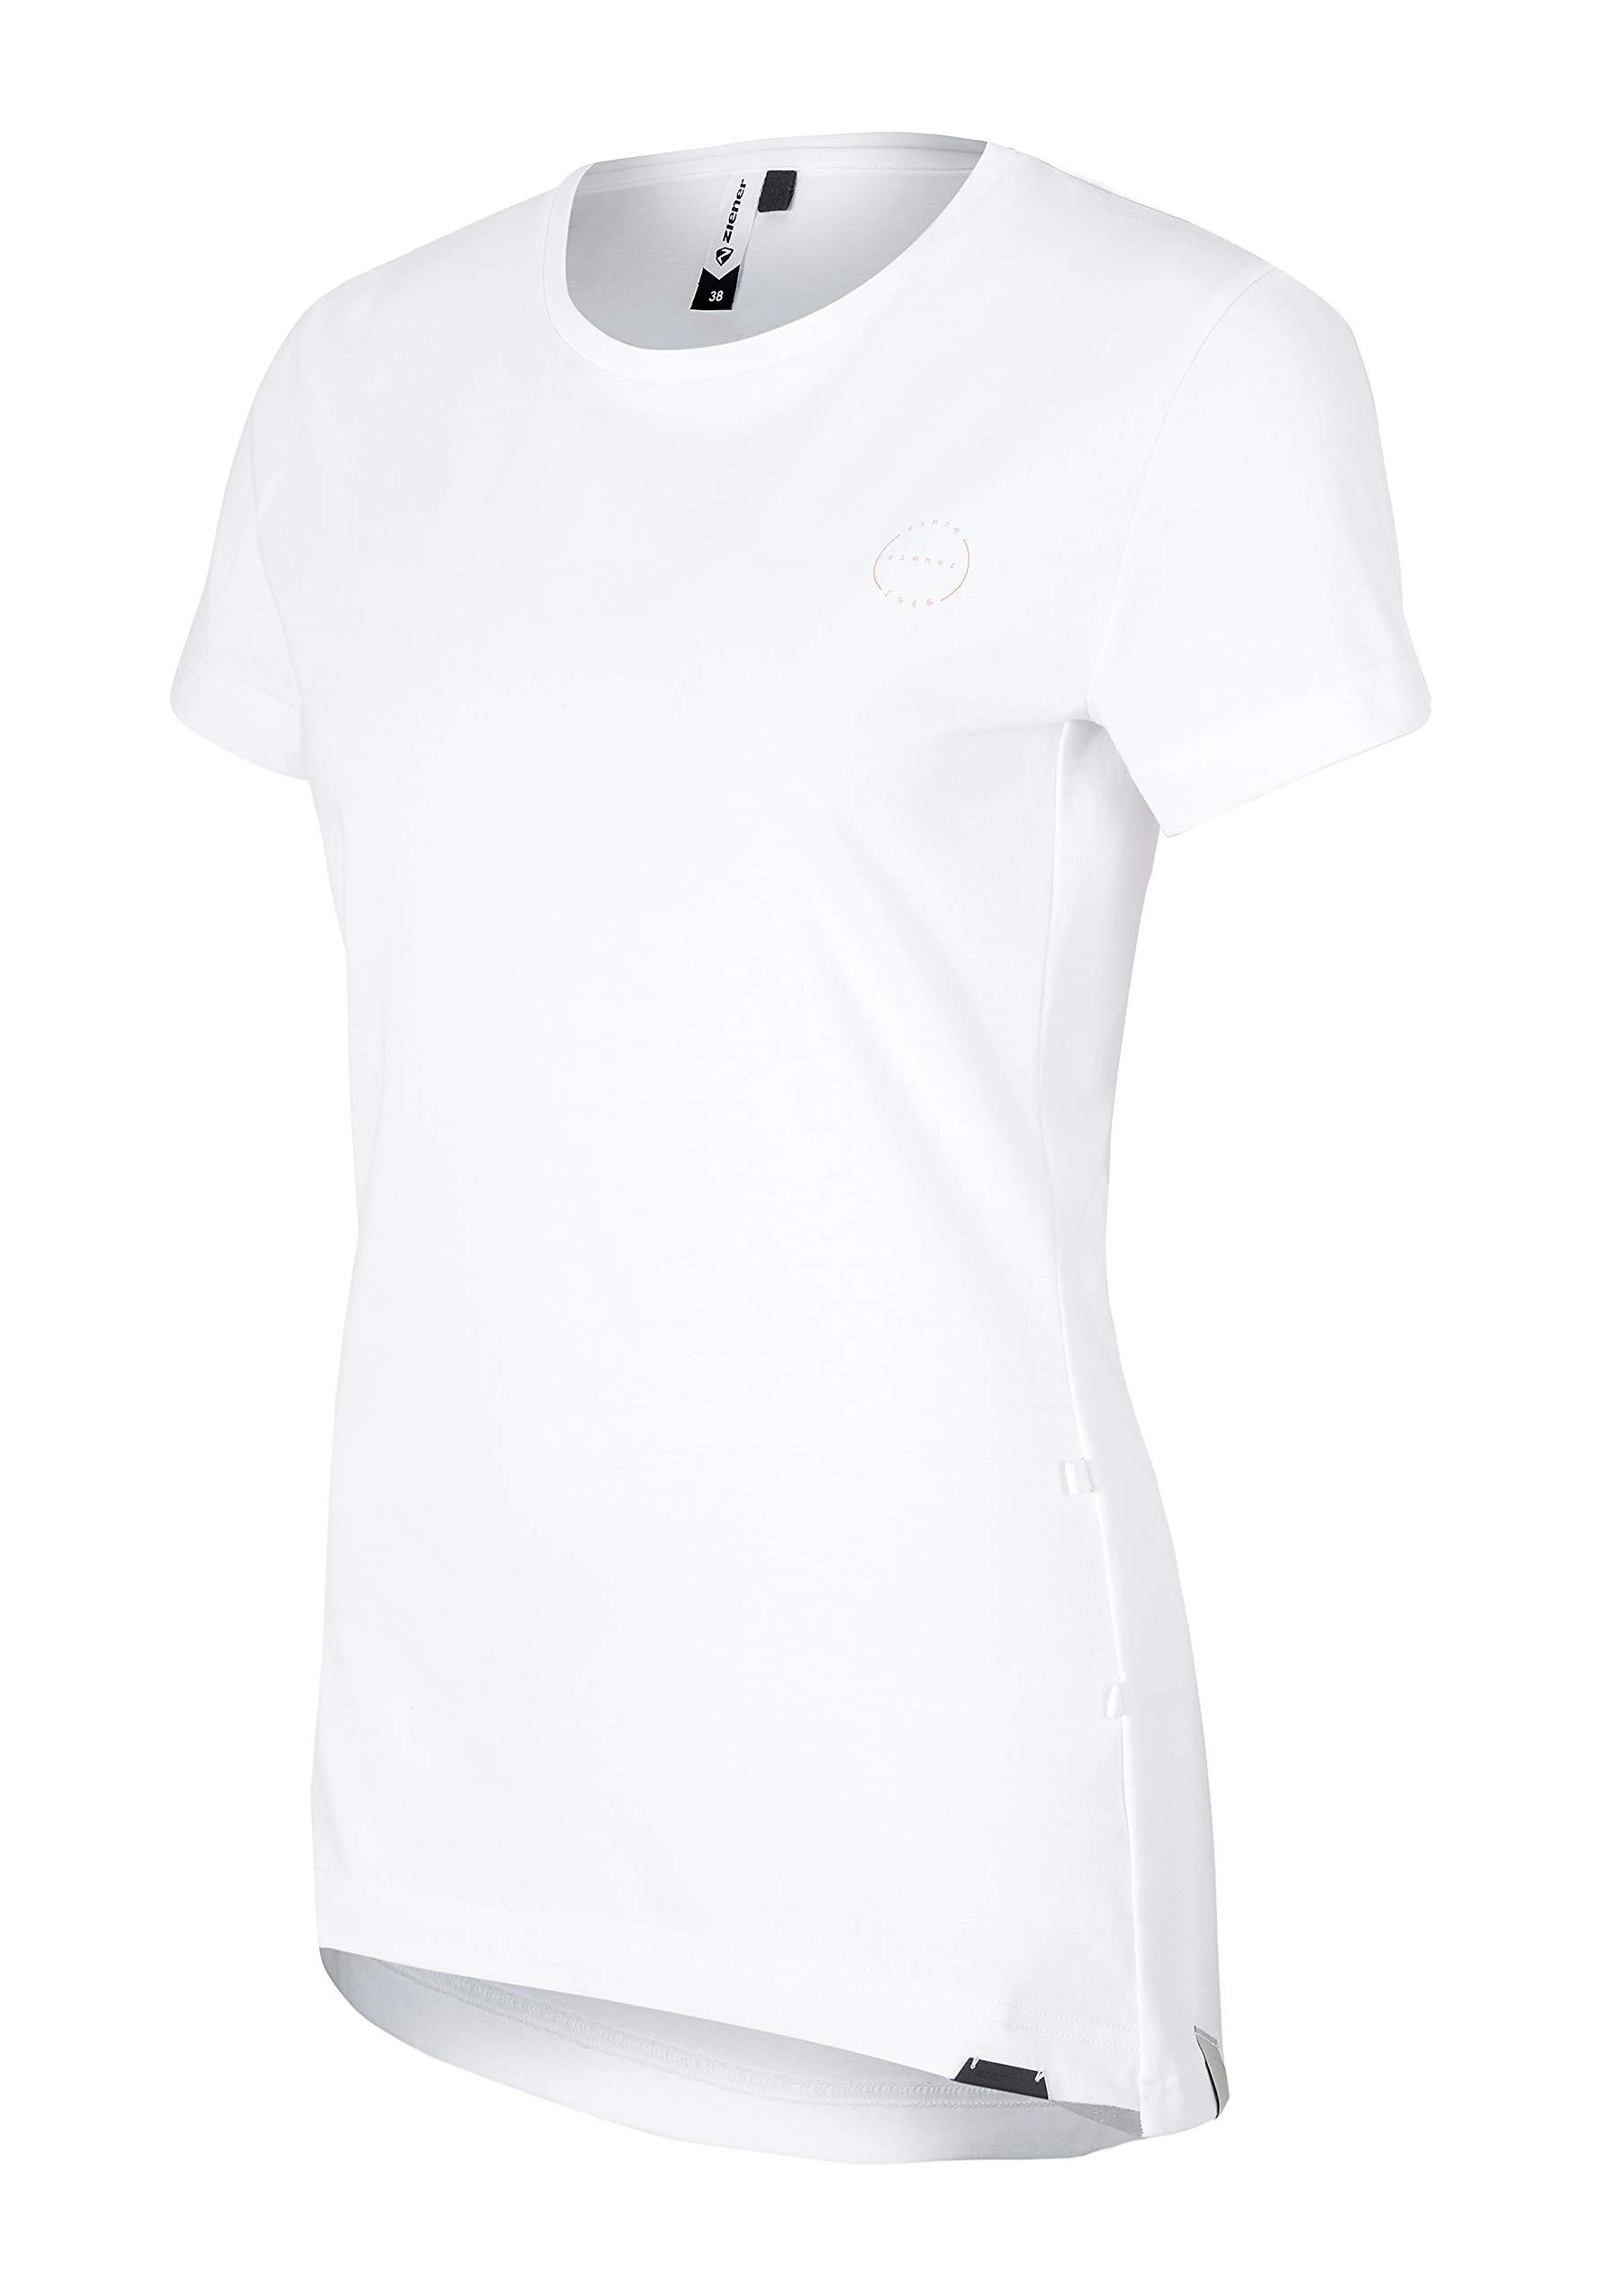 Ziener Damen ROSL lady (shirt) T-shirt